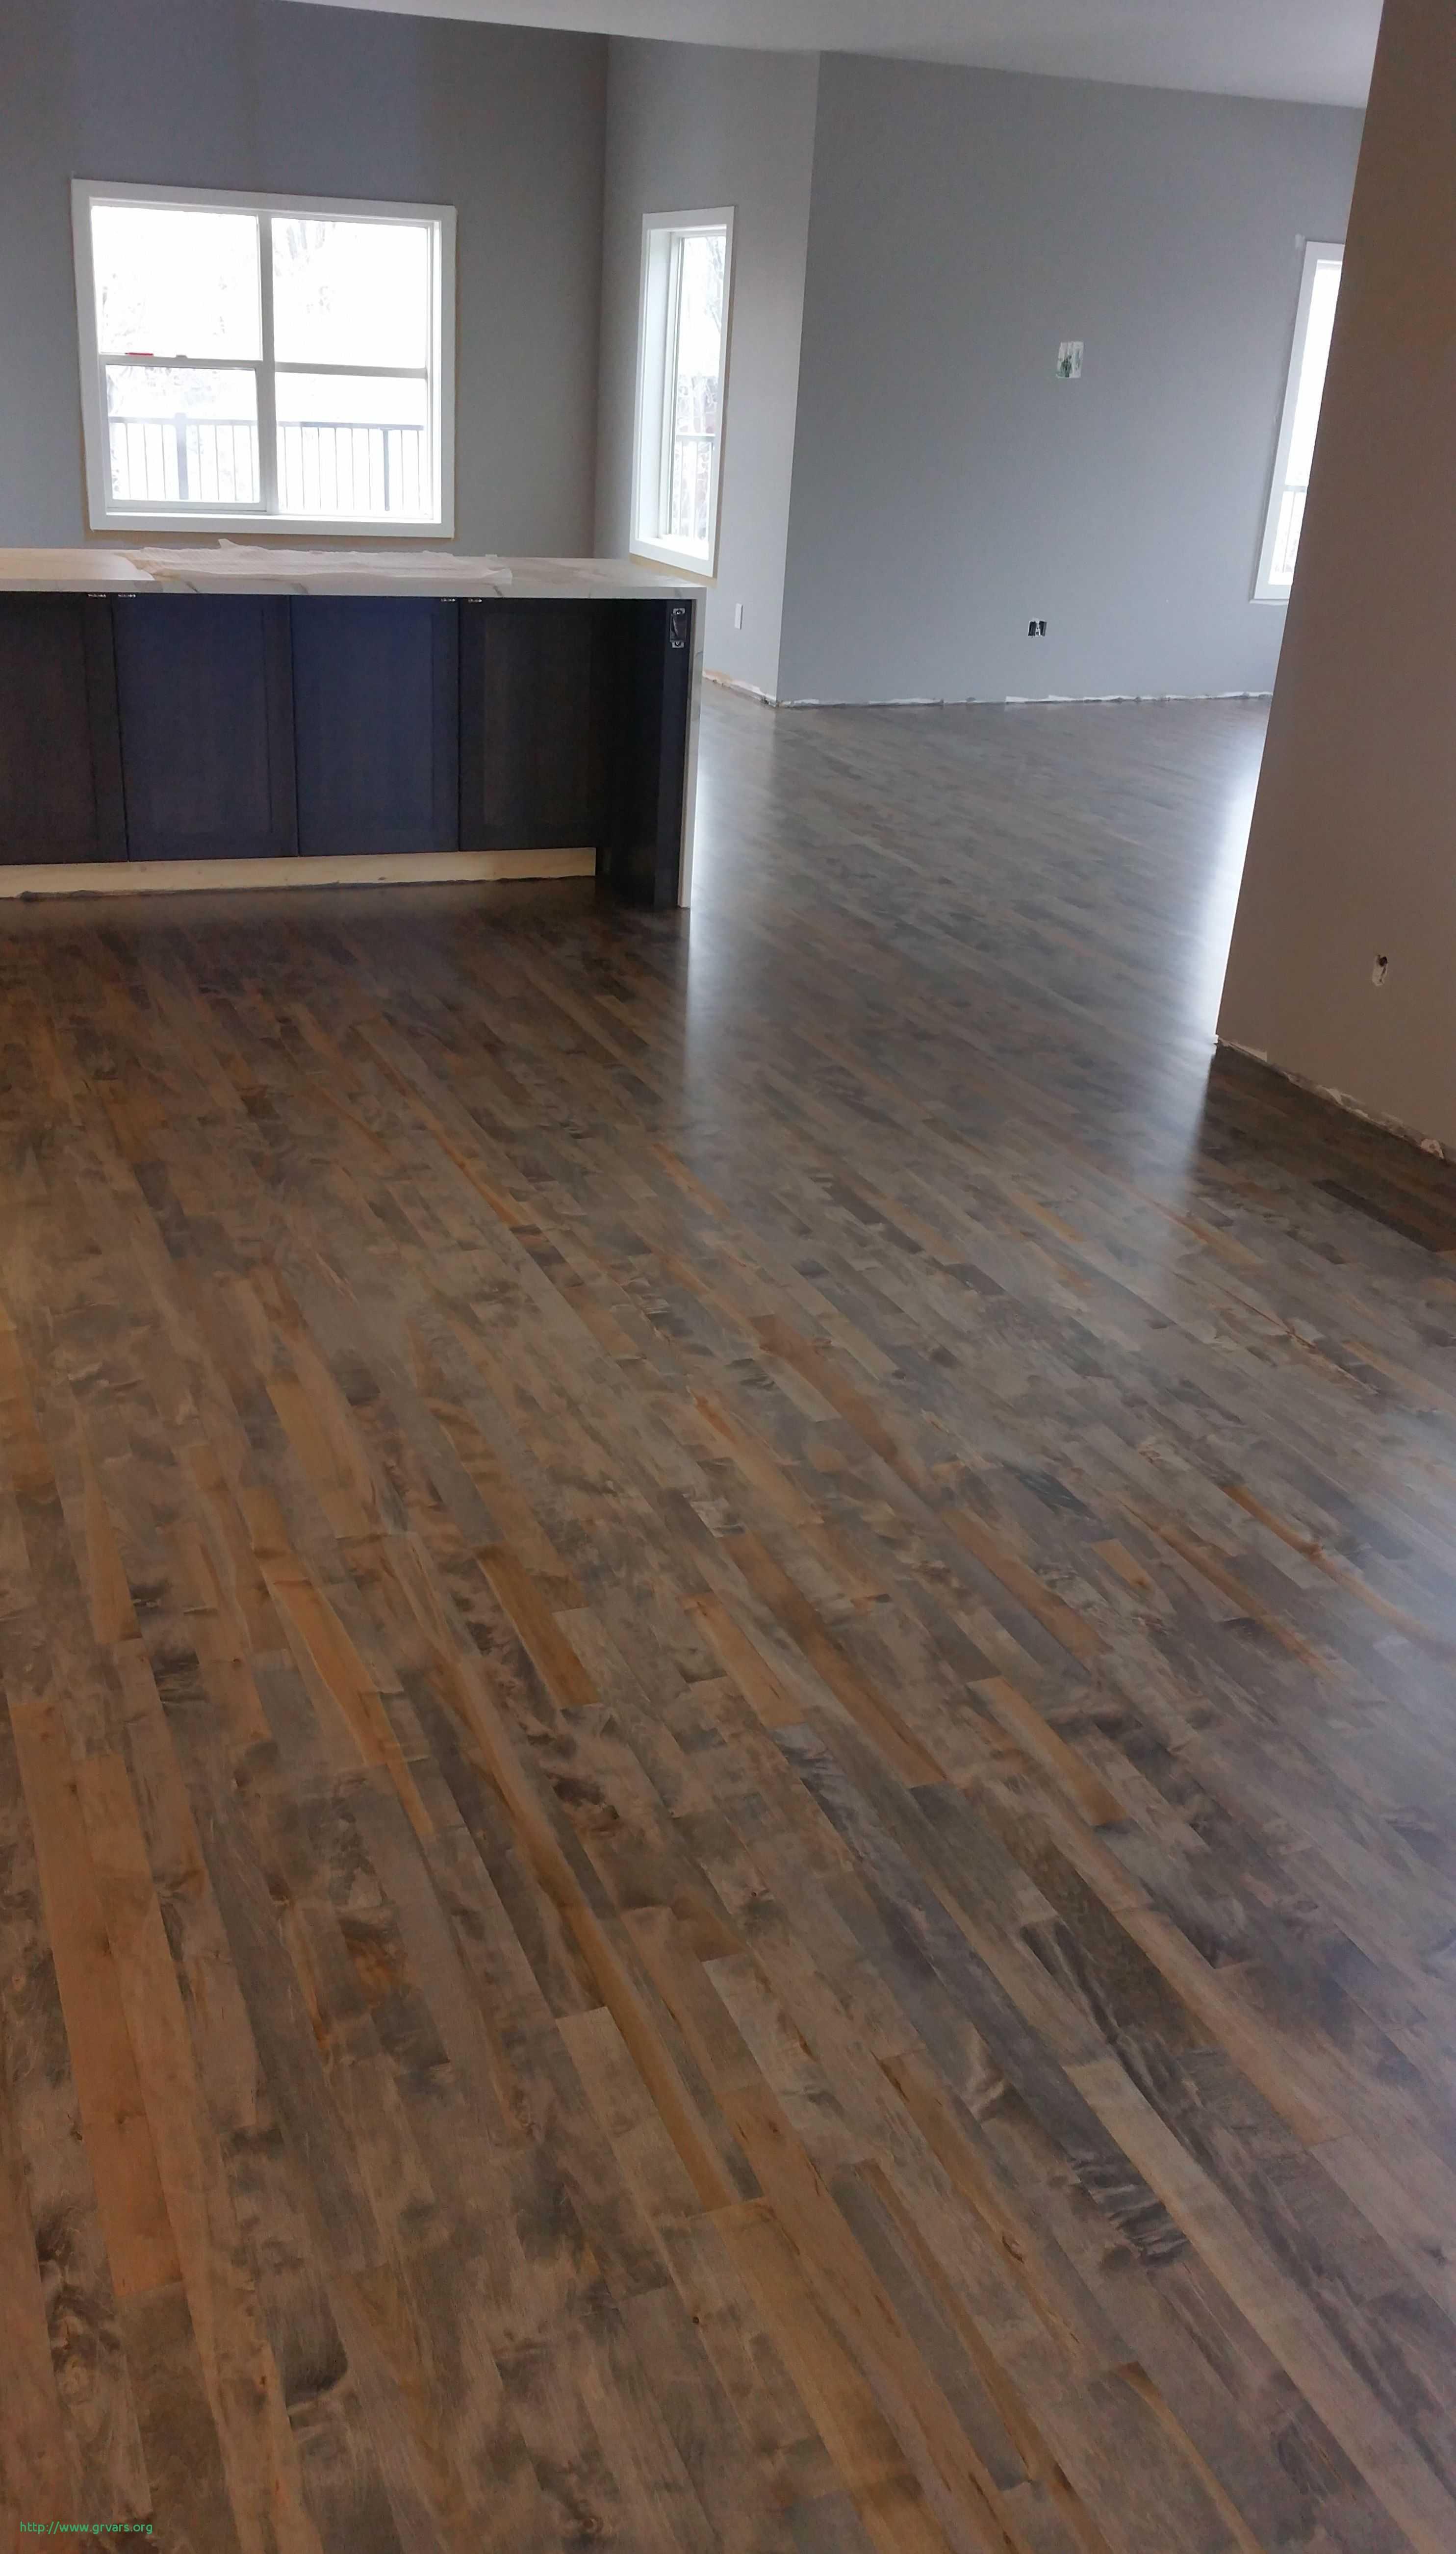 hardwood floor restoration milwaukee of inexpensive way to refinish hardwood floors wikizie co in best way to refinish hardwood floors inspirant how finish wood